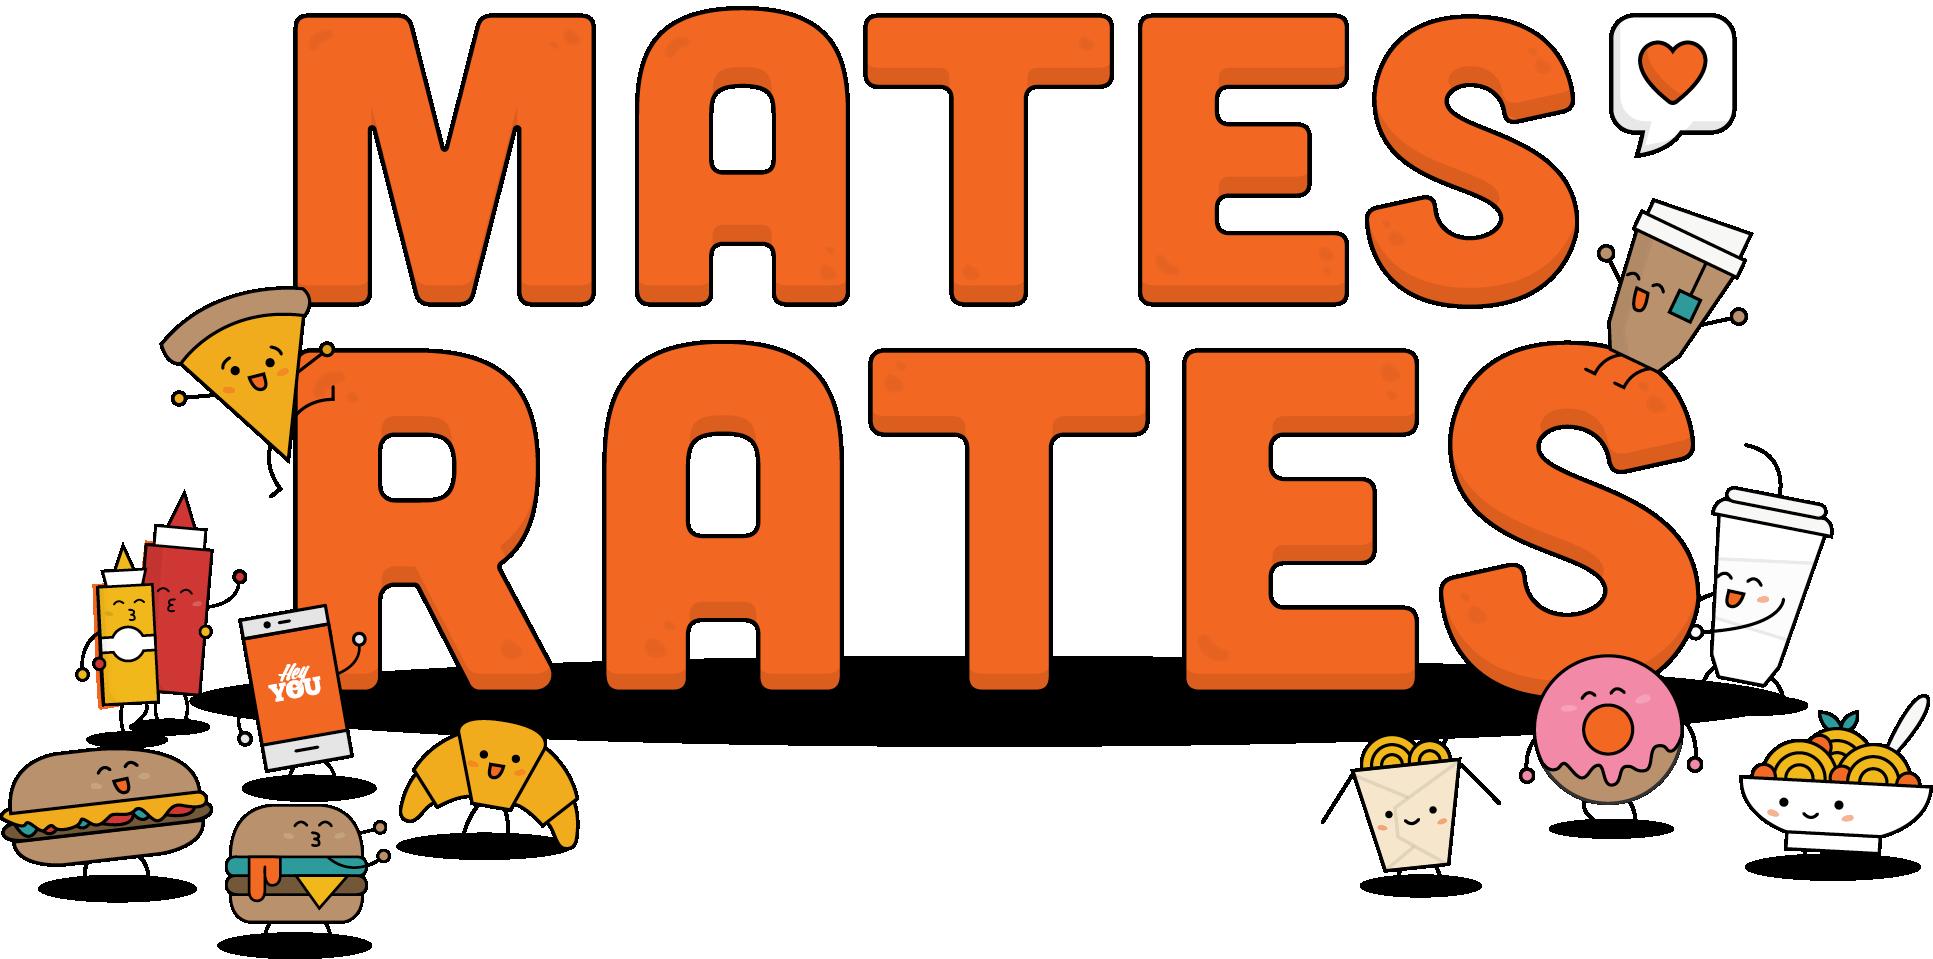 matesrates.png